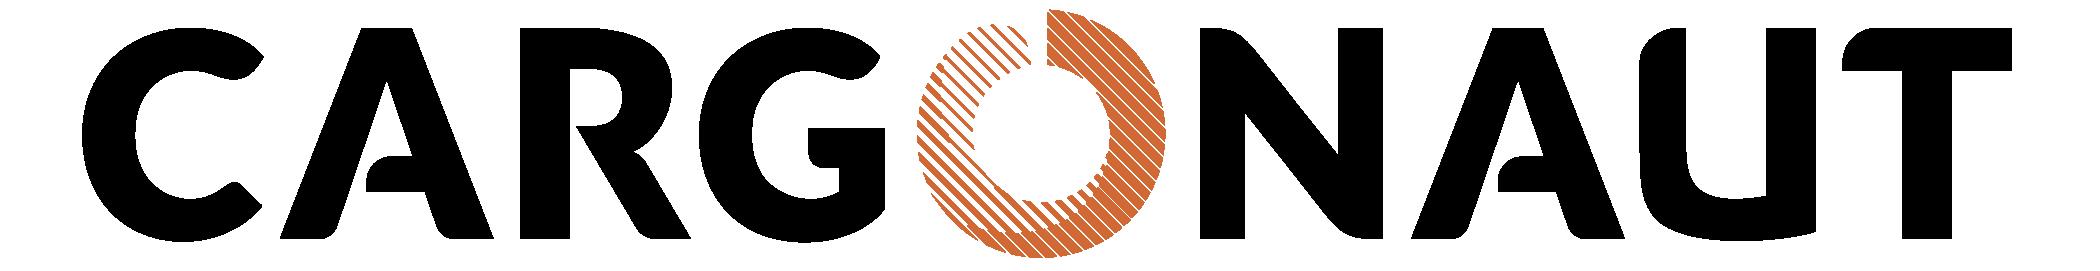 Cargonaut logo